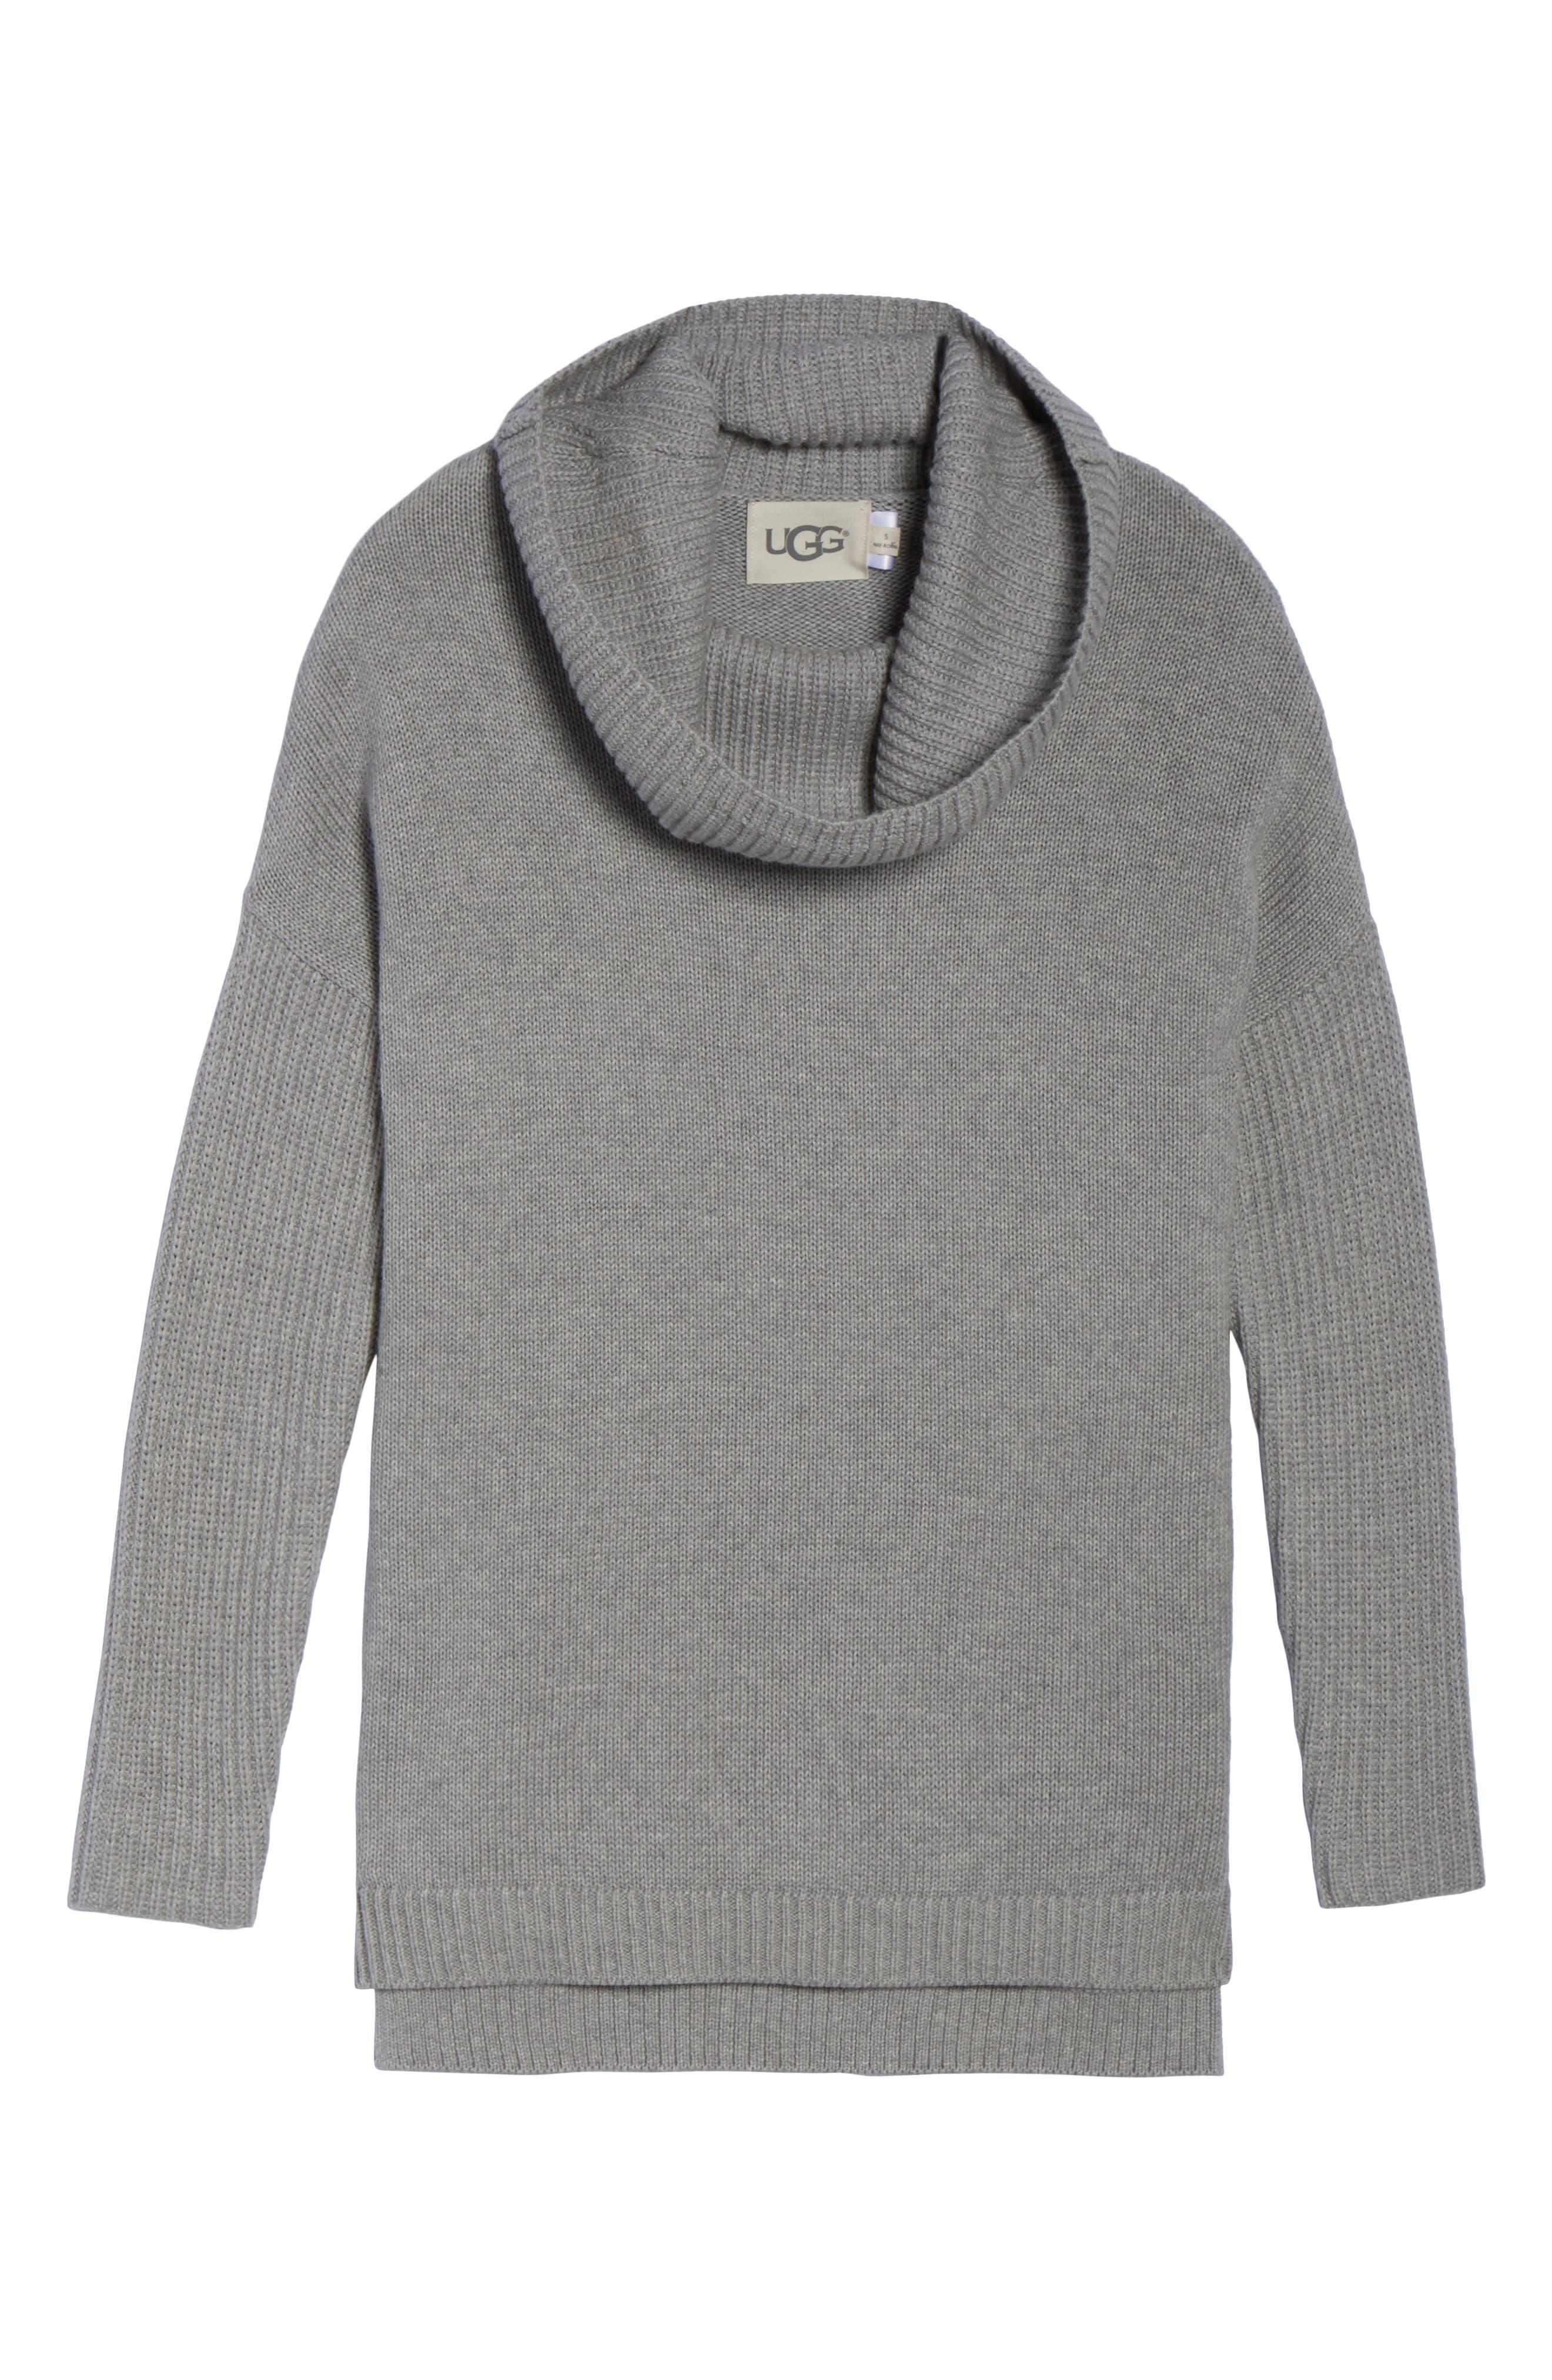 Alternate Image 4  - UGG® Cowl Neck Tunic Sweater